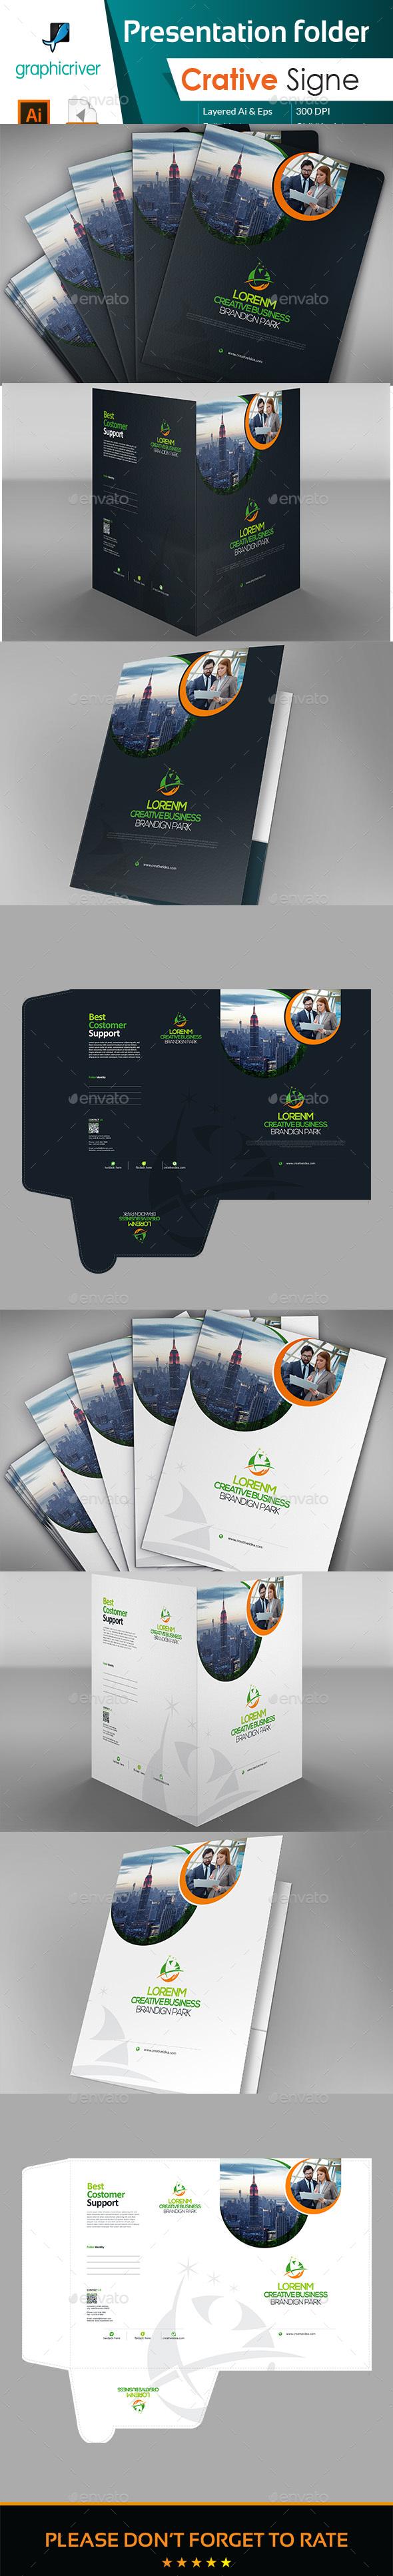 GraphicRiver Corporate Folder Presentation 20497367